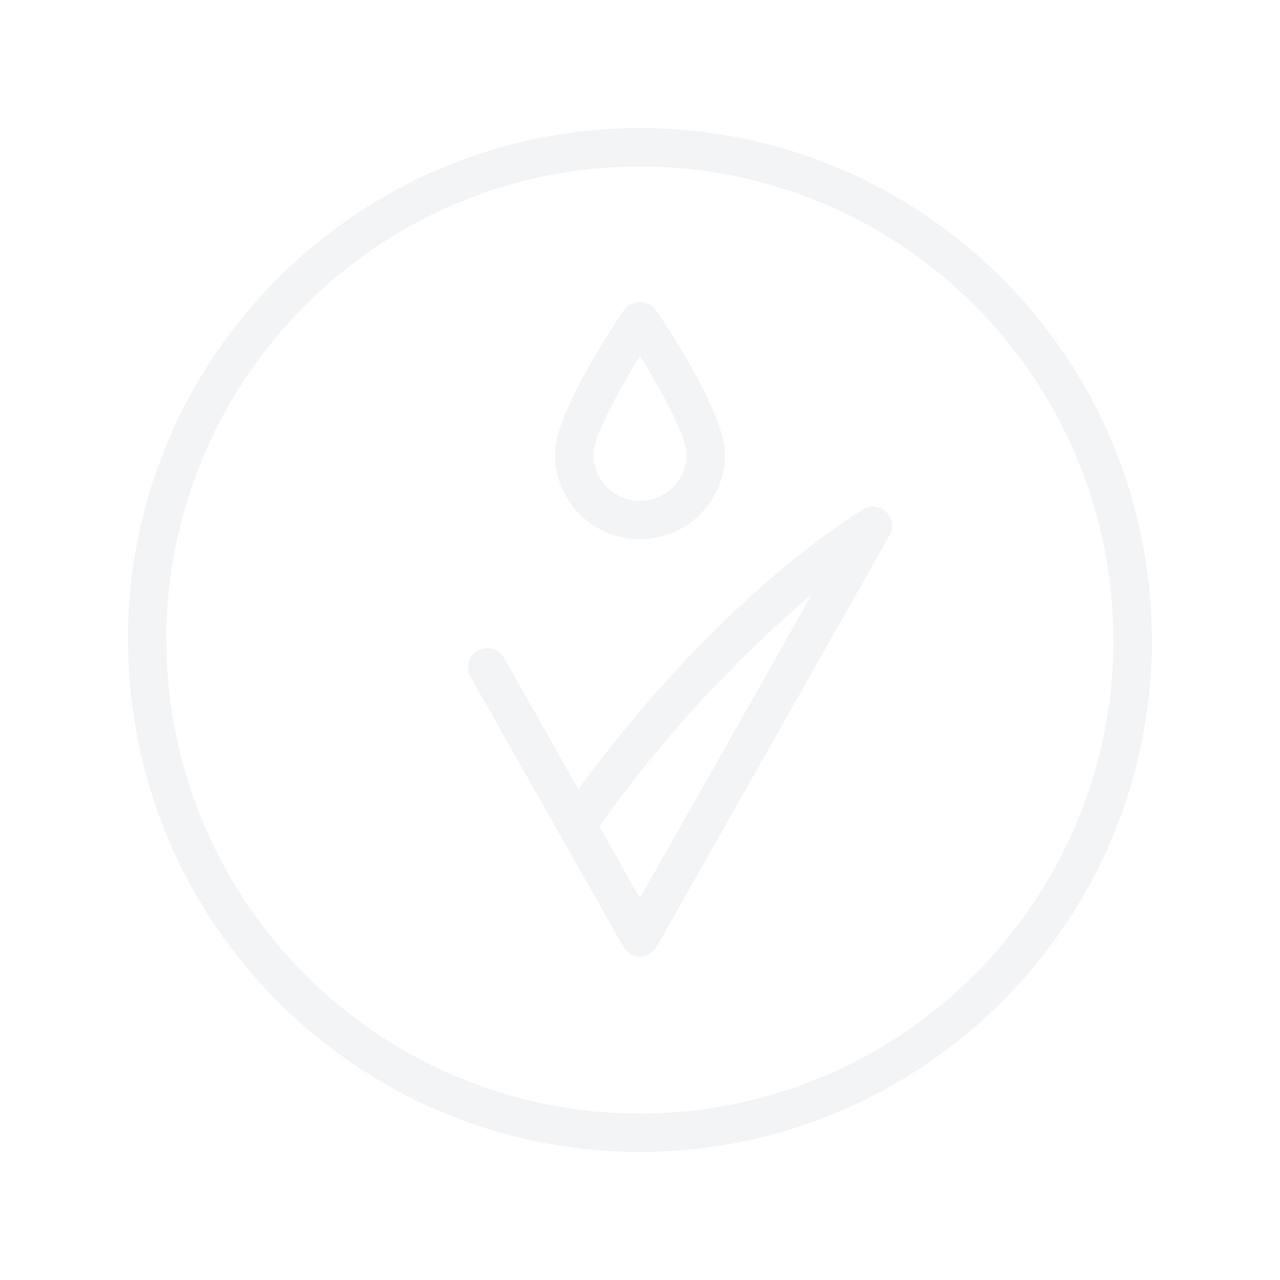 MUA Pixel Perfect Multi-Higlight Moonstone Shine 8.9g